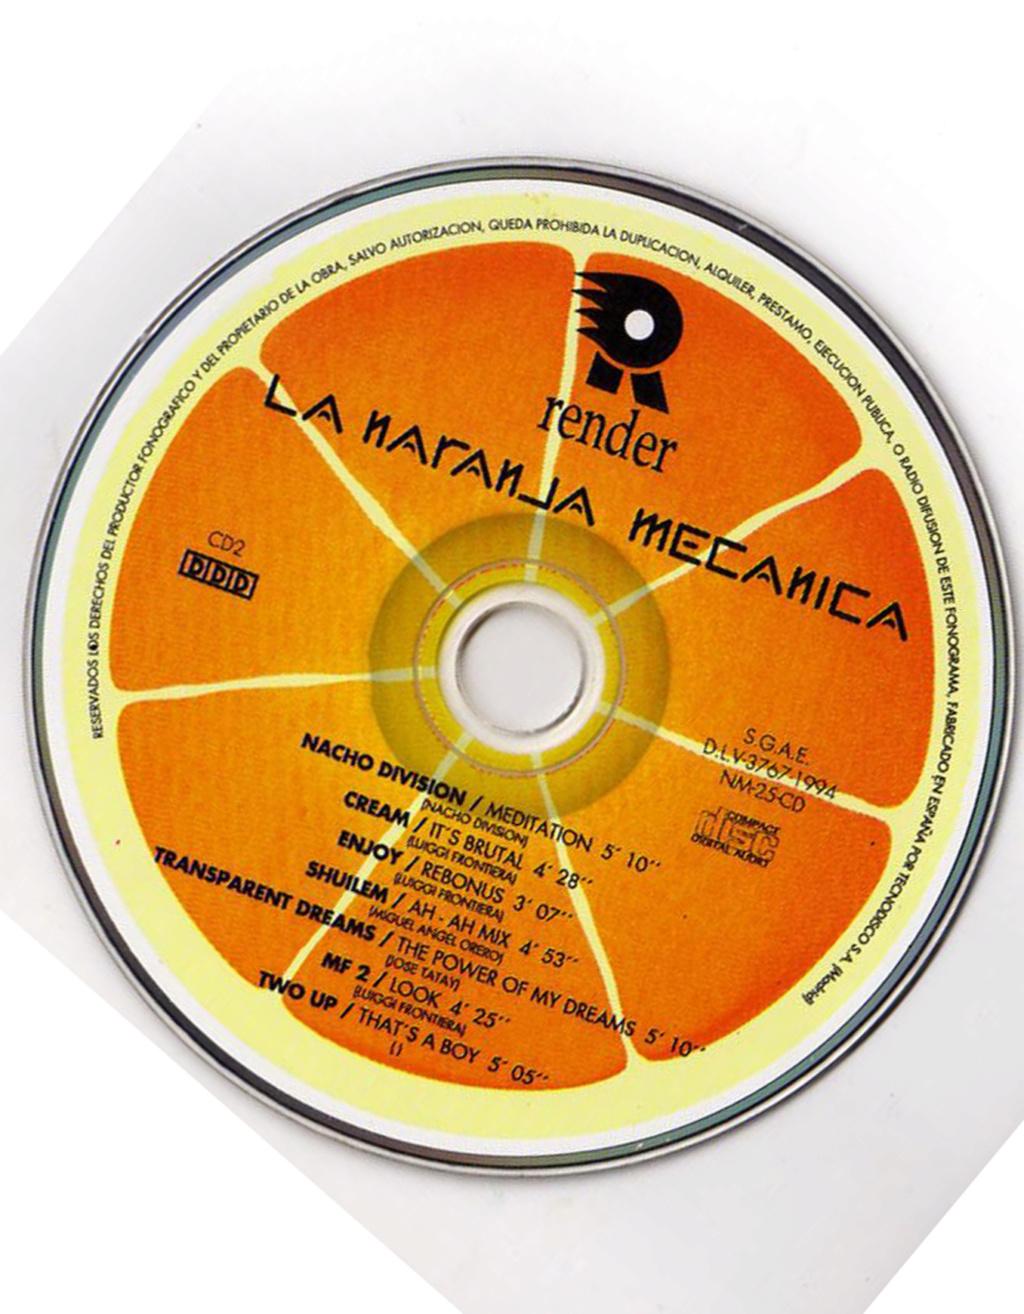 LA NARANJA MECANICA (1994) render music  Cd-210